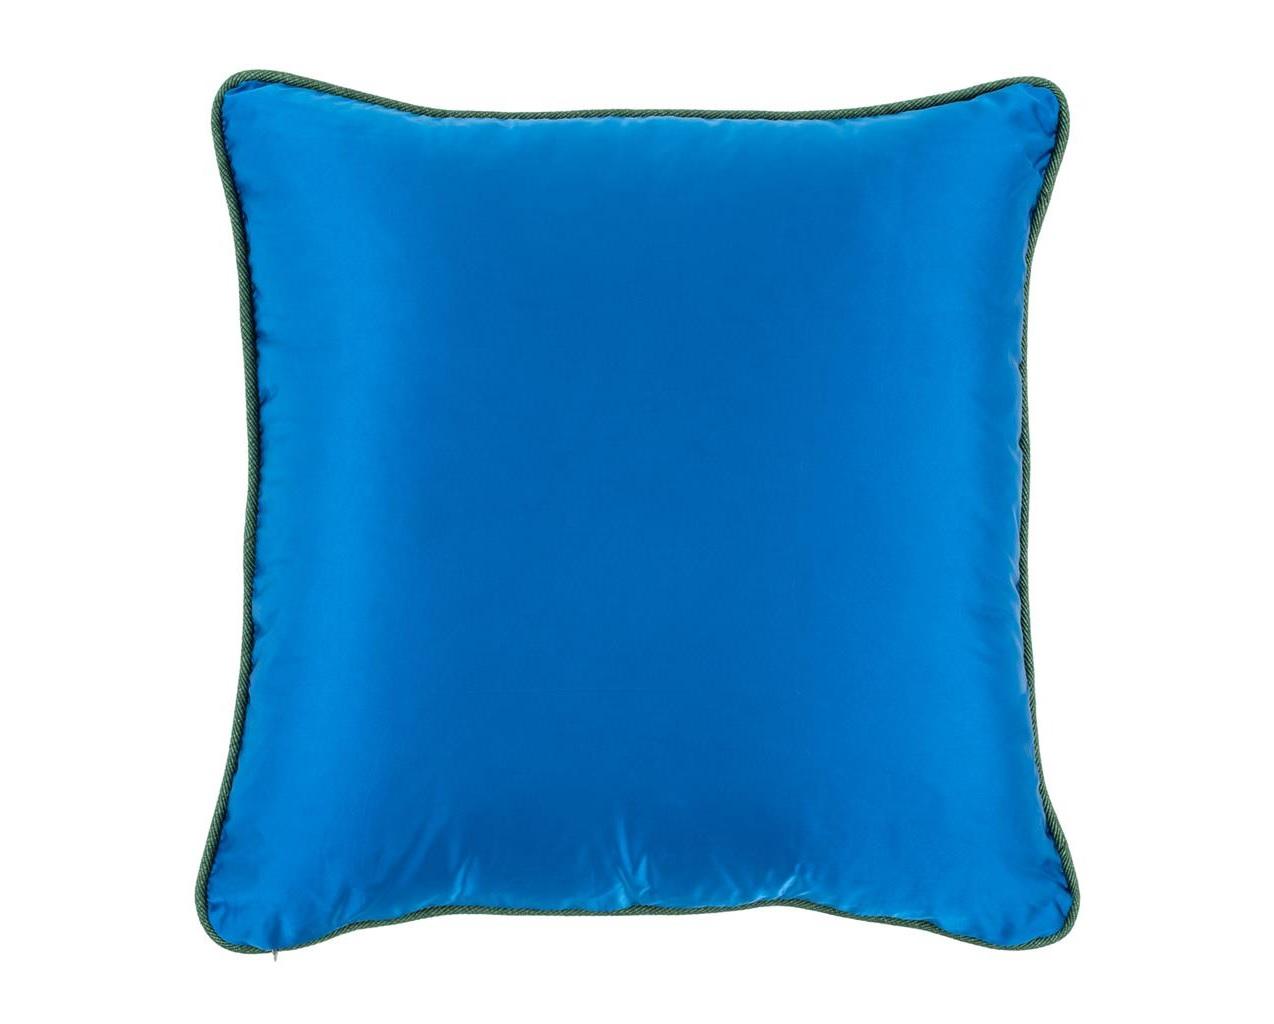 Подушка AlbinКвадратные подушки и наволочки<br><br><br>Material: Текстиль